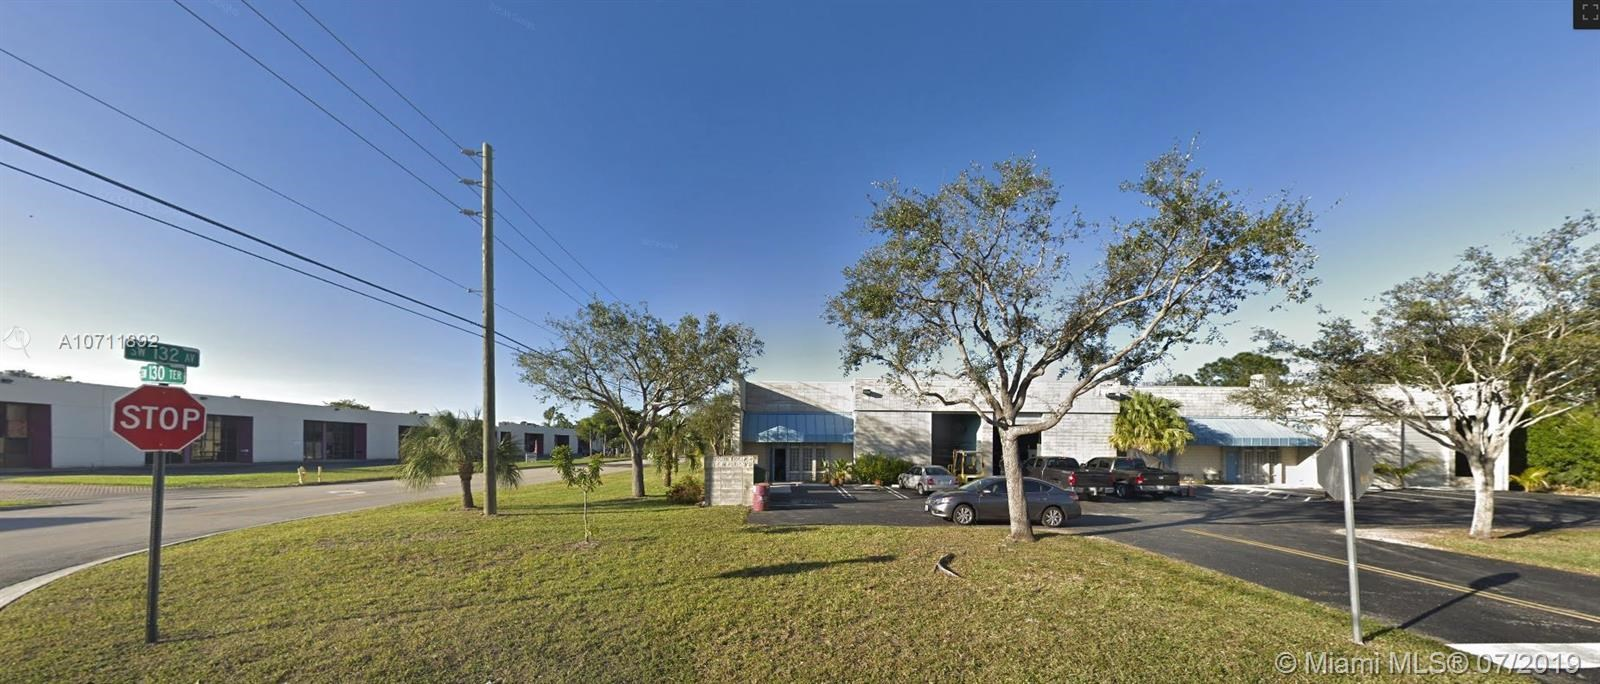 13055 SW 132nd Ave, Miami, FL 33186